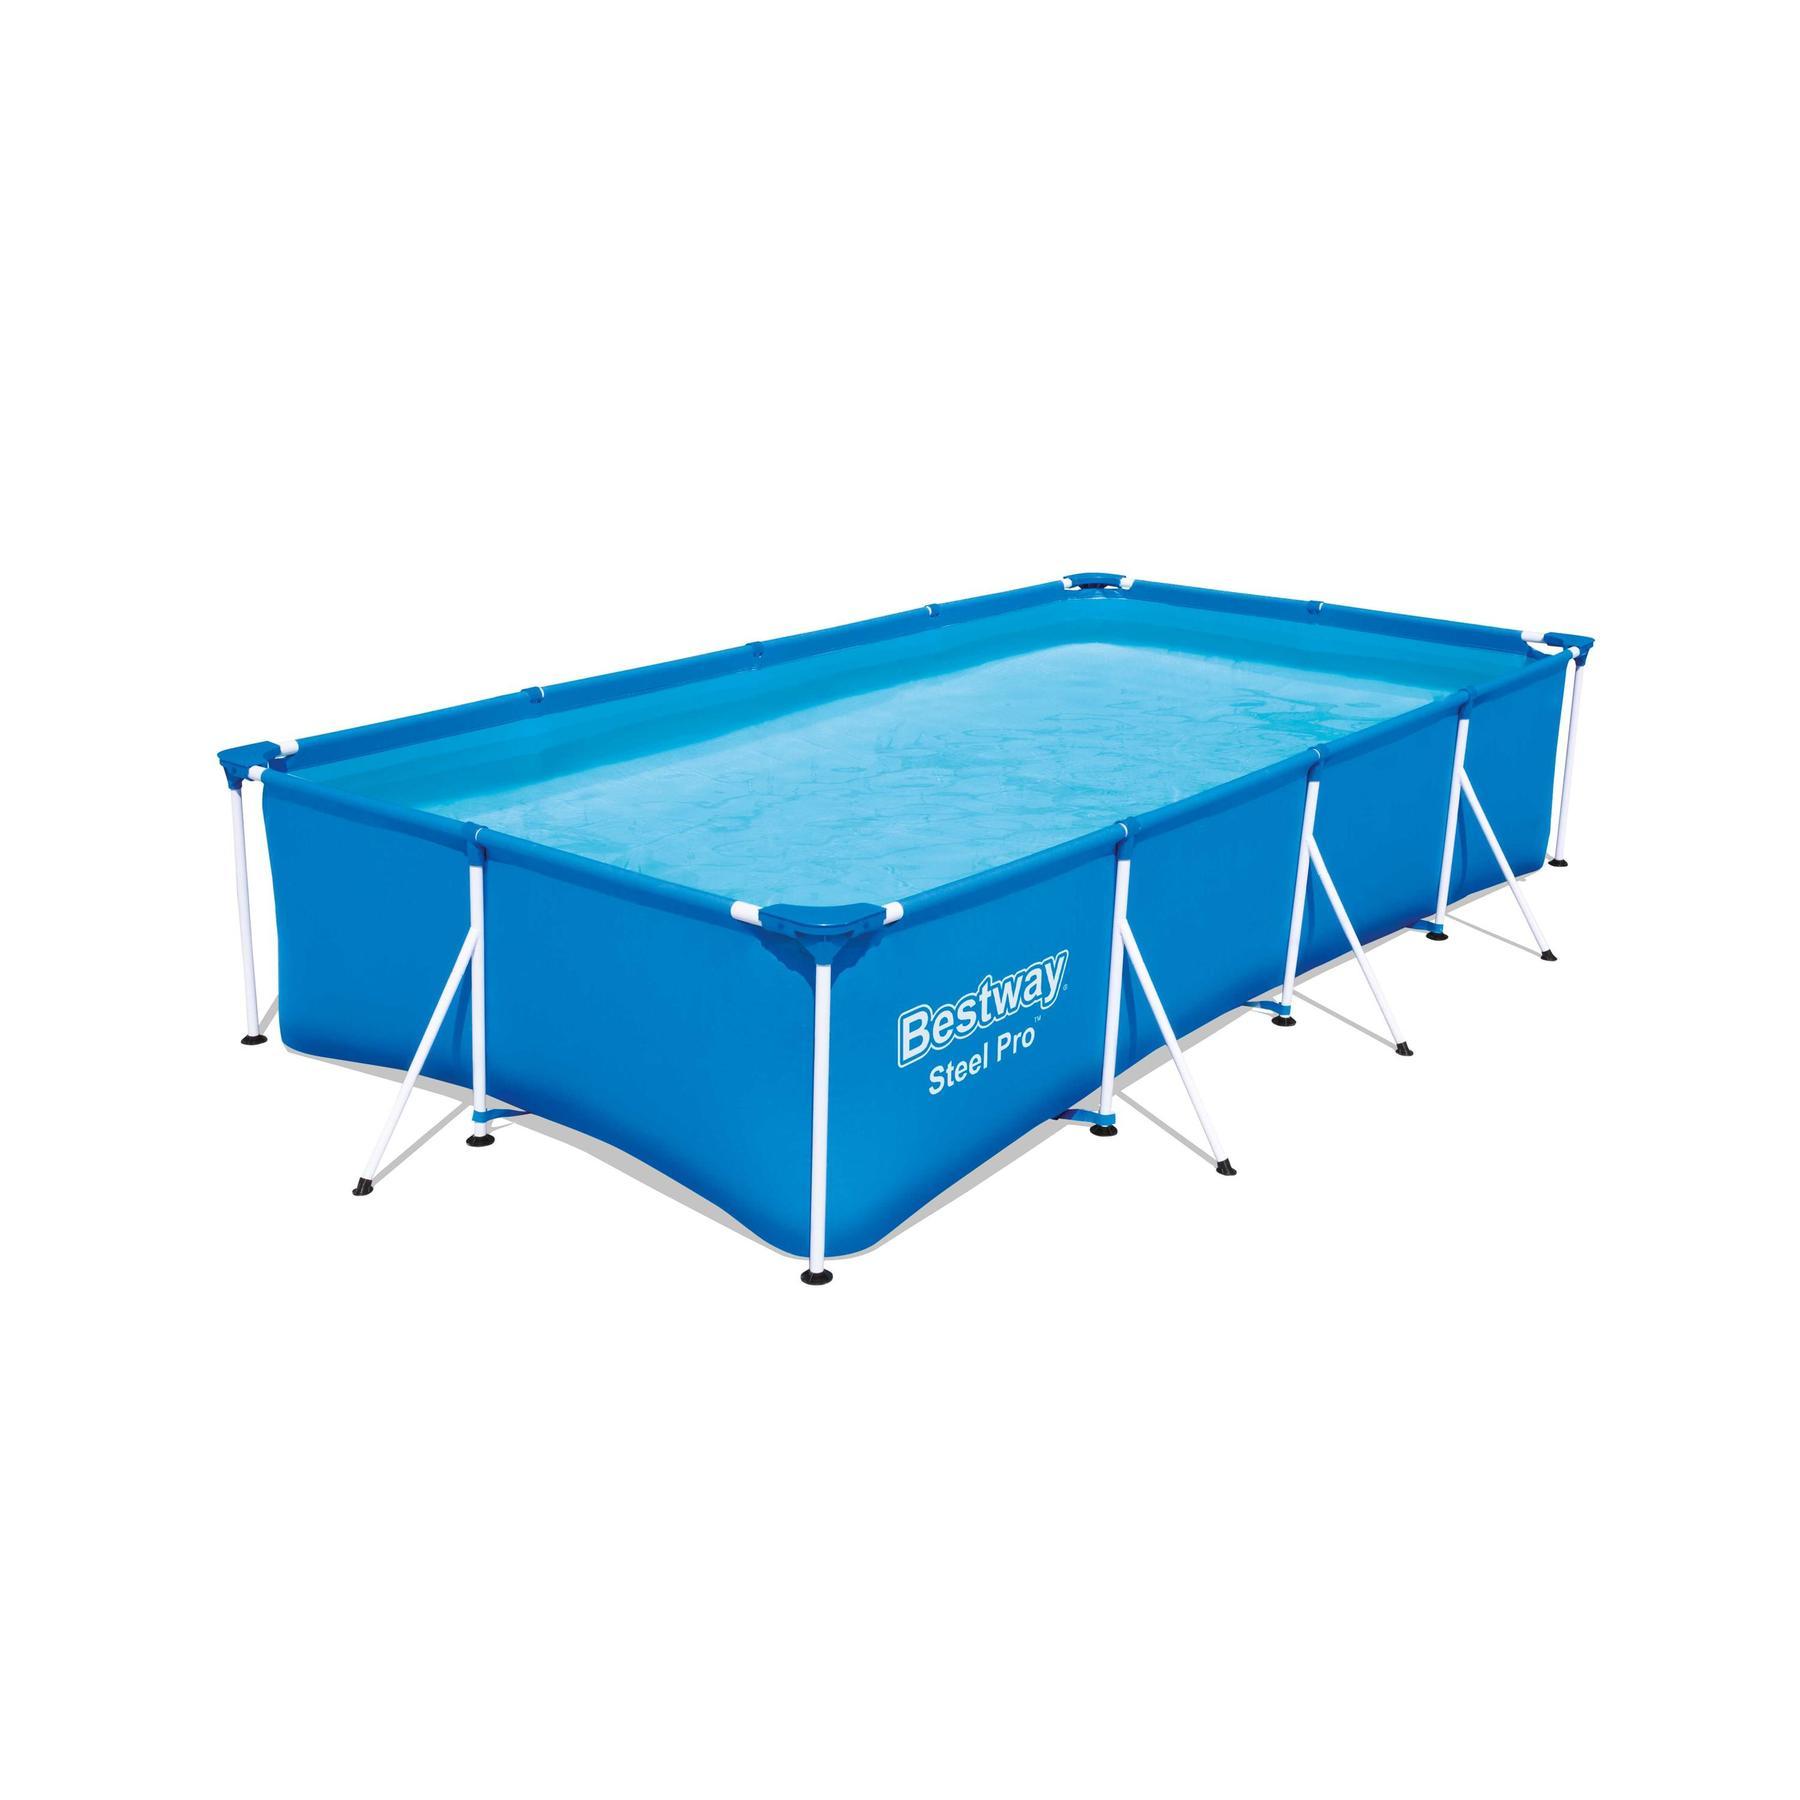 Scaffold Rectangular Pool 400 х211х81 Cm, 5700 L, Bestway Family Splash, Item No. 56405